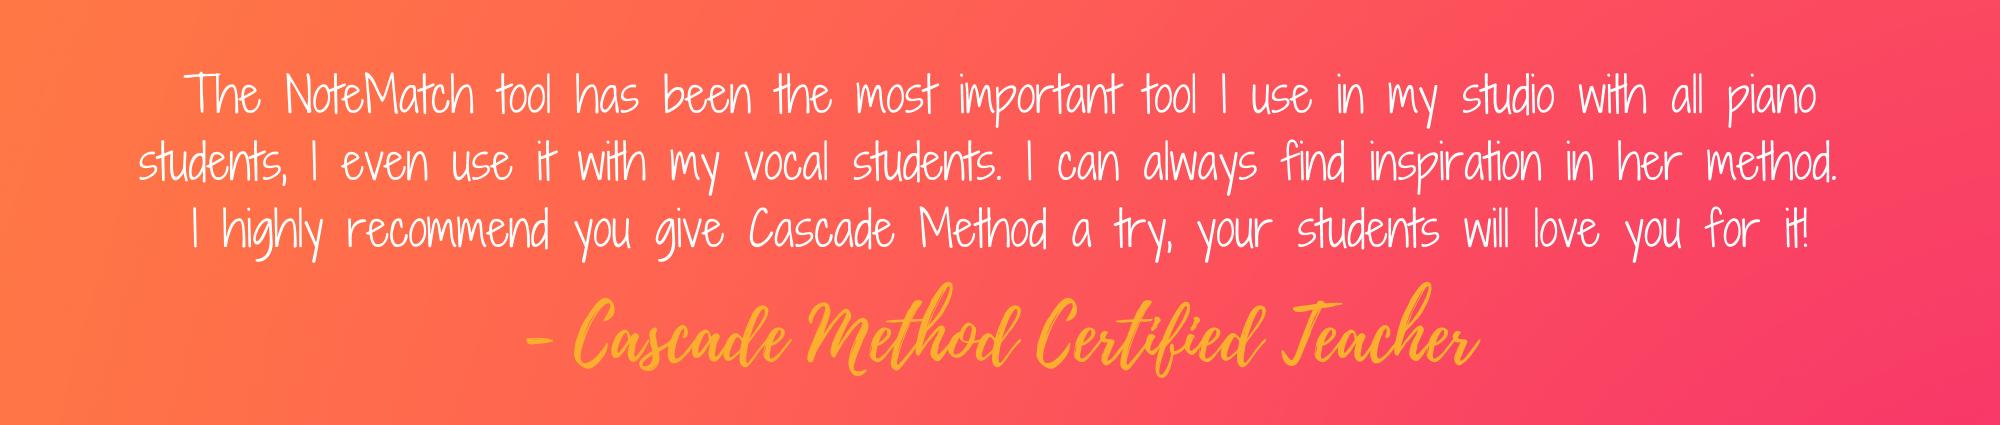 Cascade Method testimonial